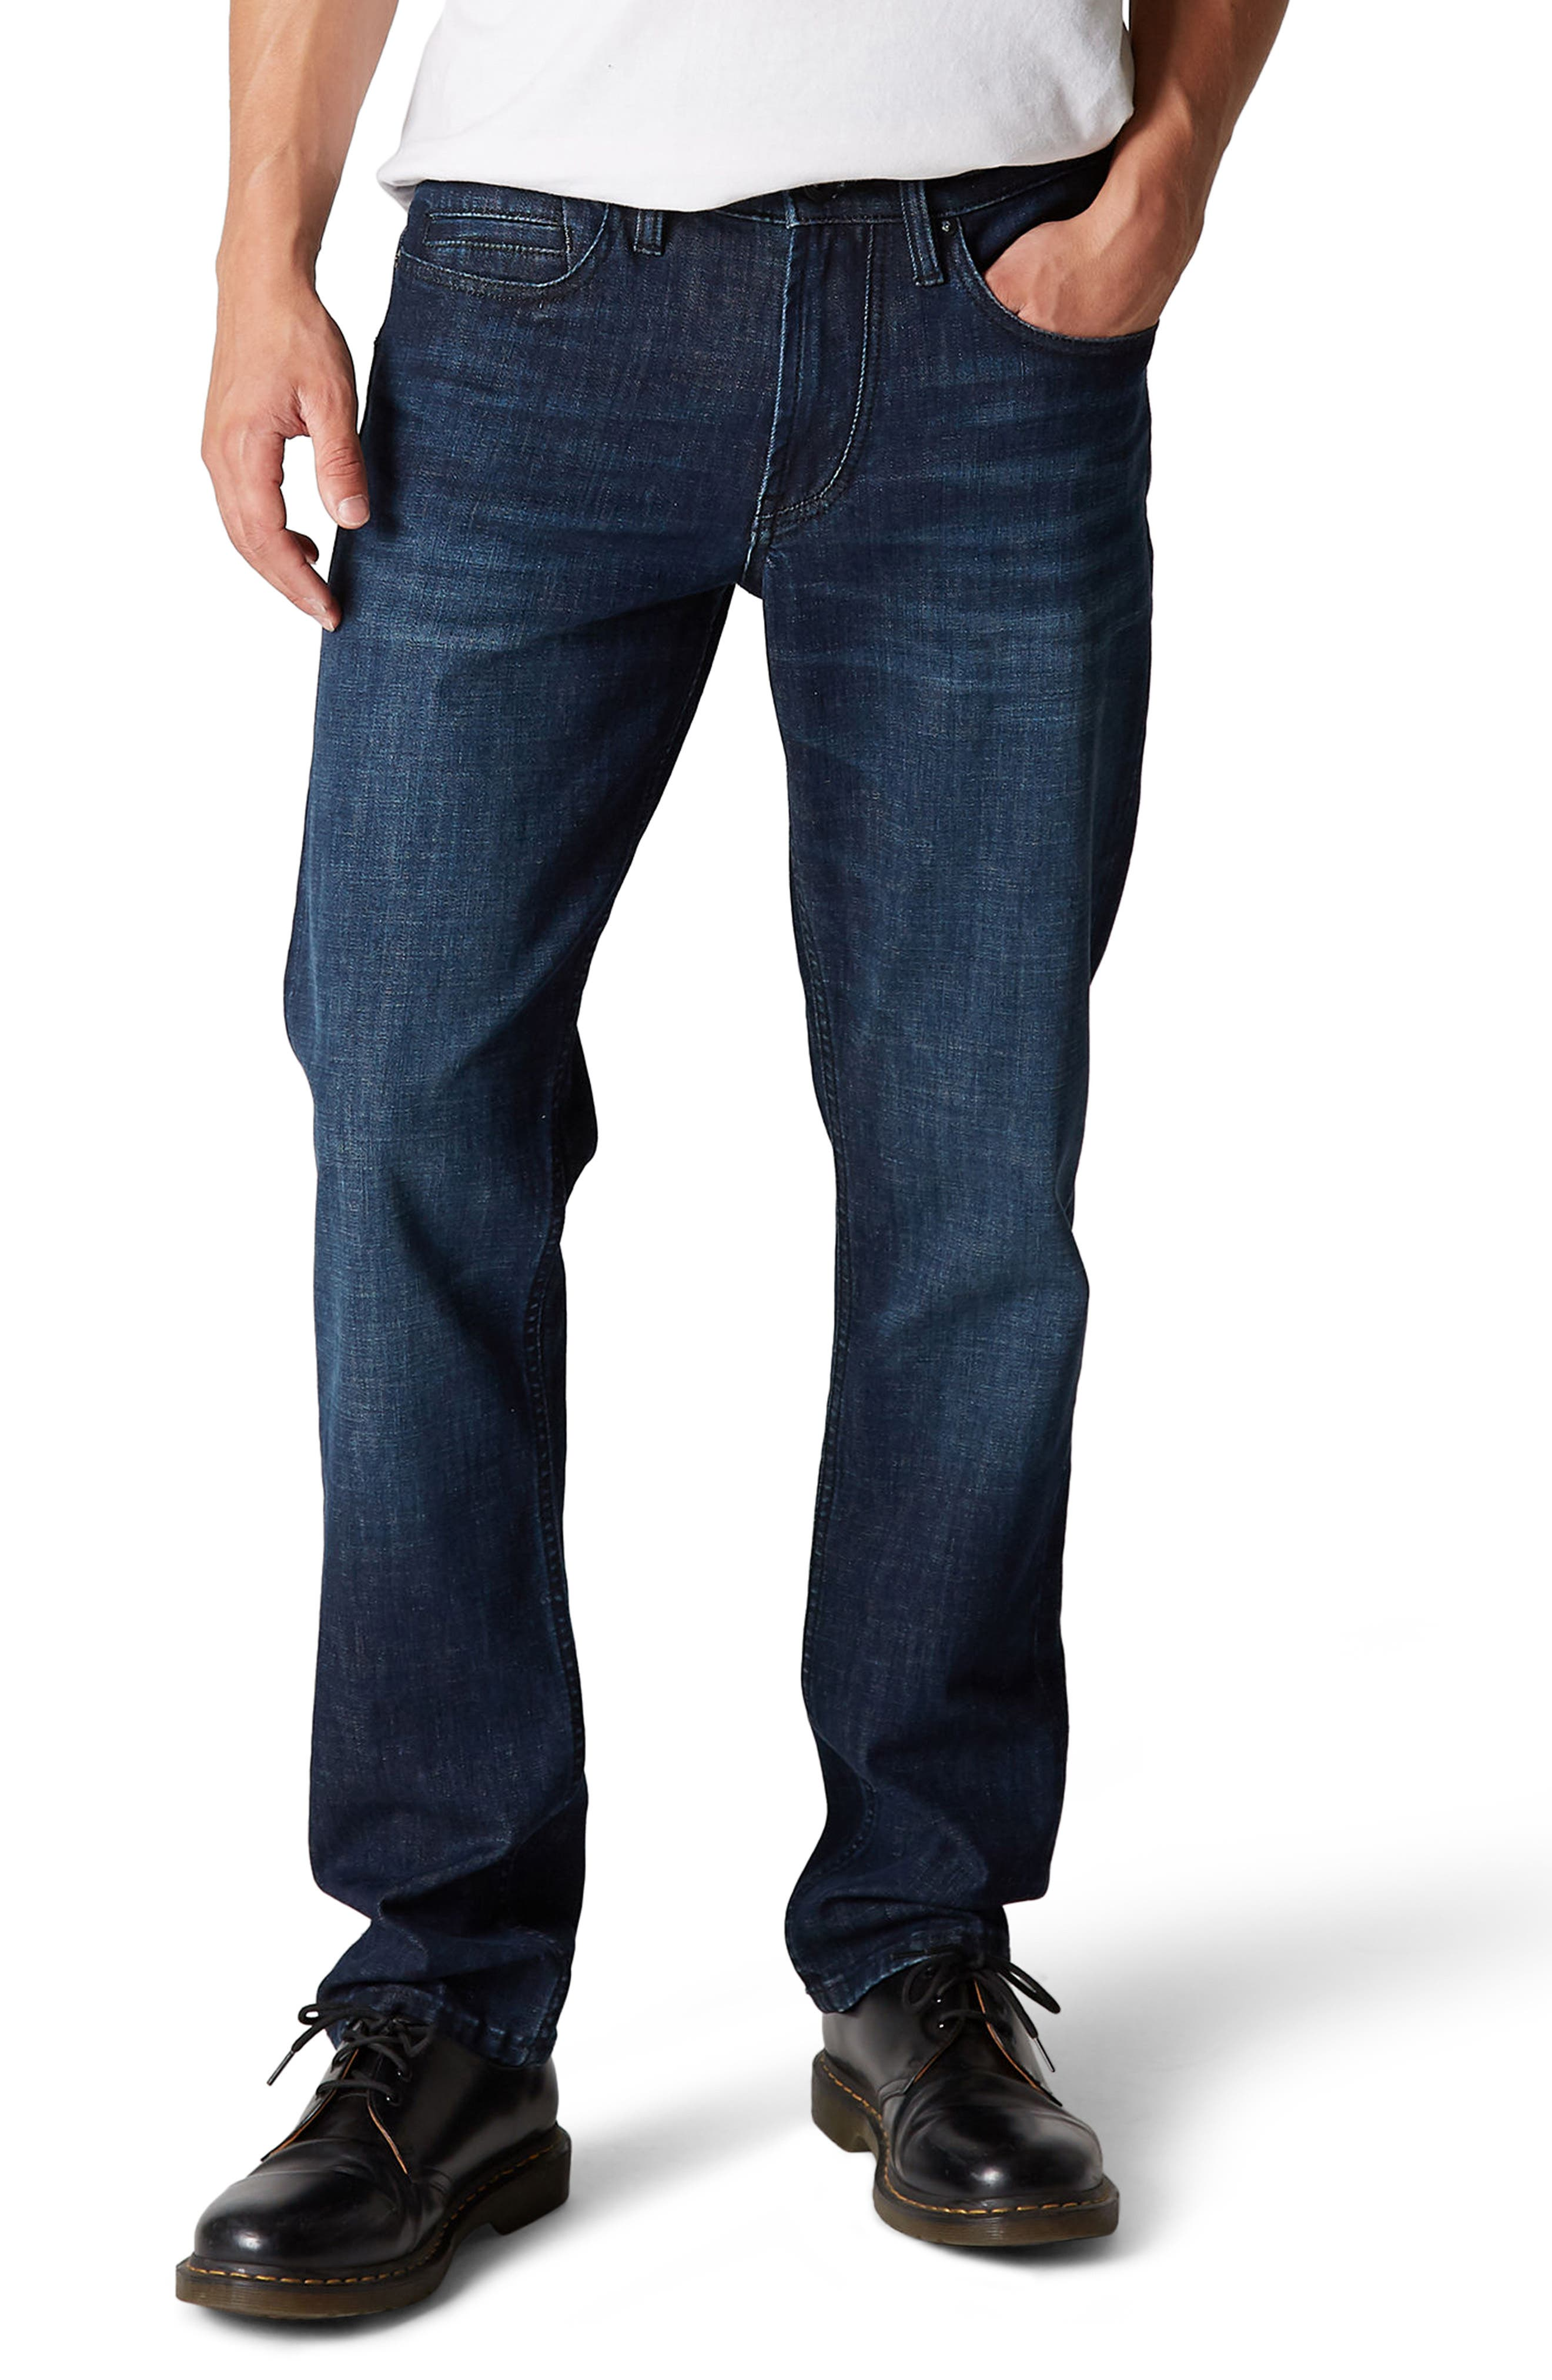 Wooster Slim Fit Jeans,                             Main thumbnail 1, color,                             Ten Strikes